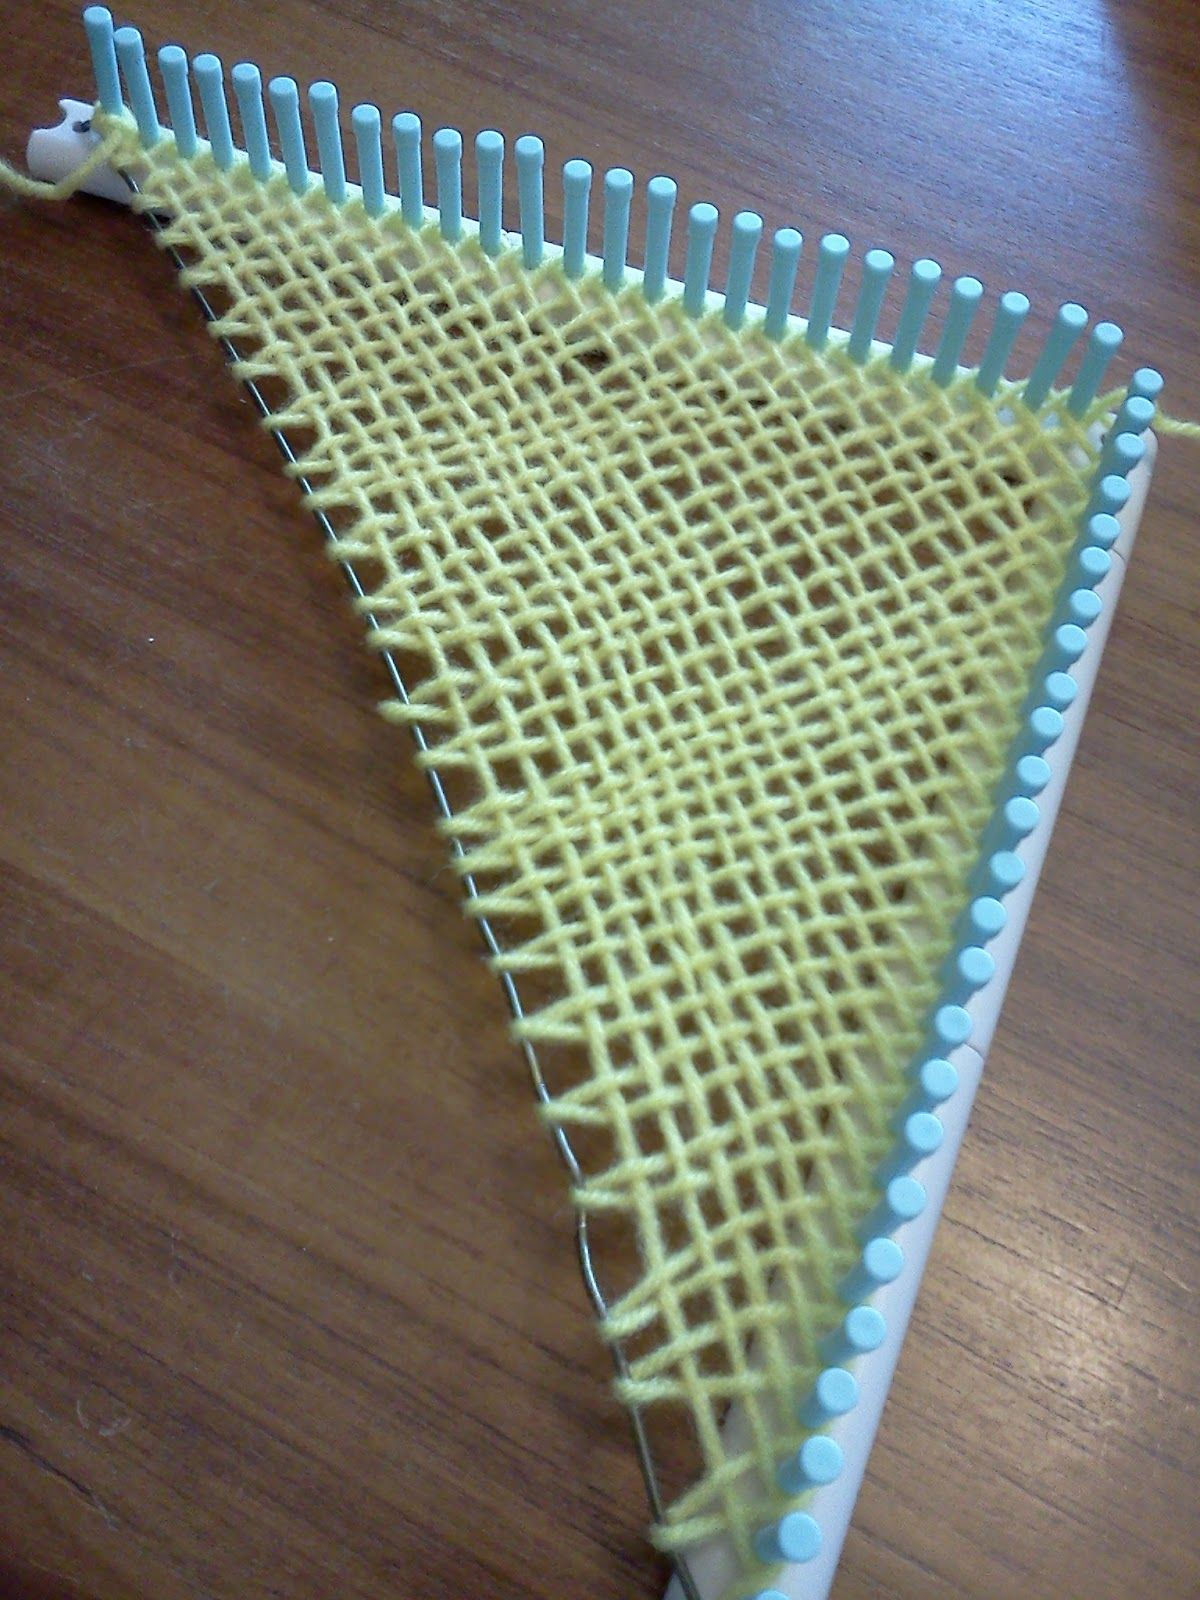 Using the Martha Stewart loom and a coat hangar to weave a triangle ...